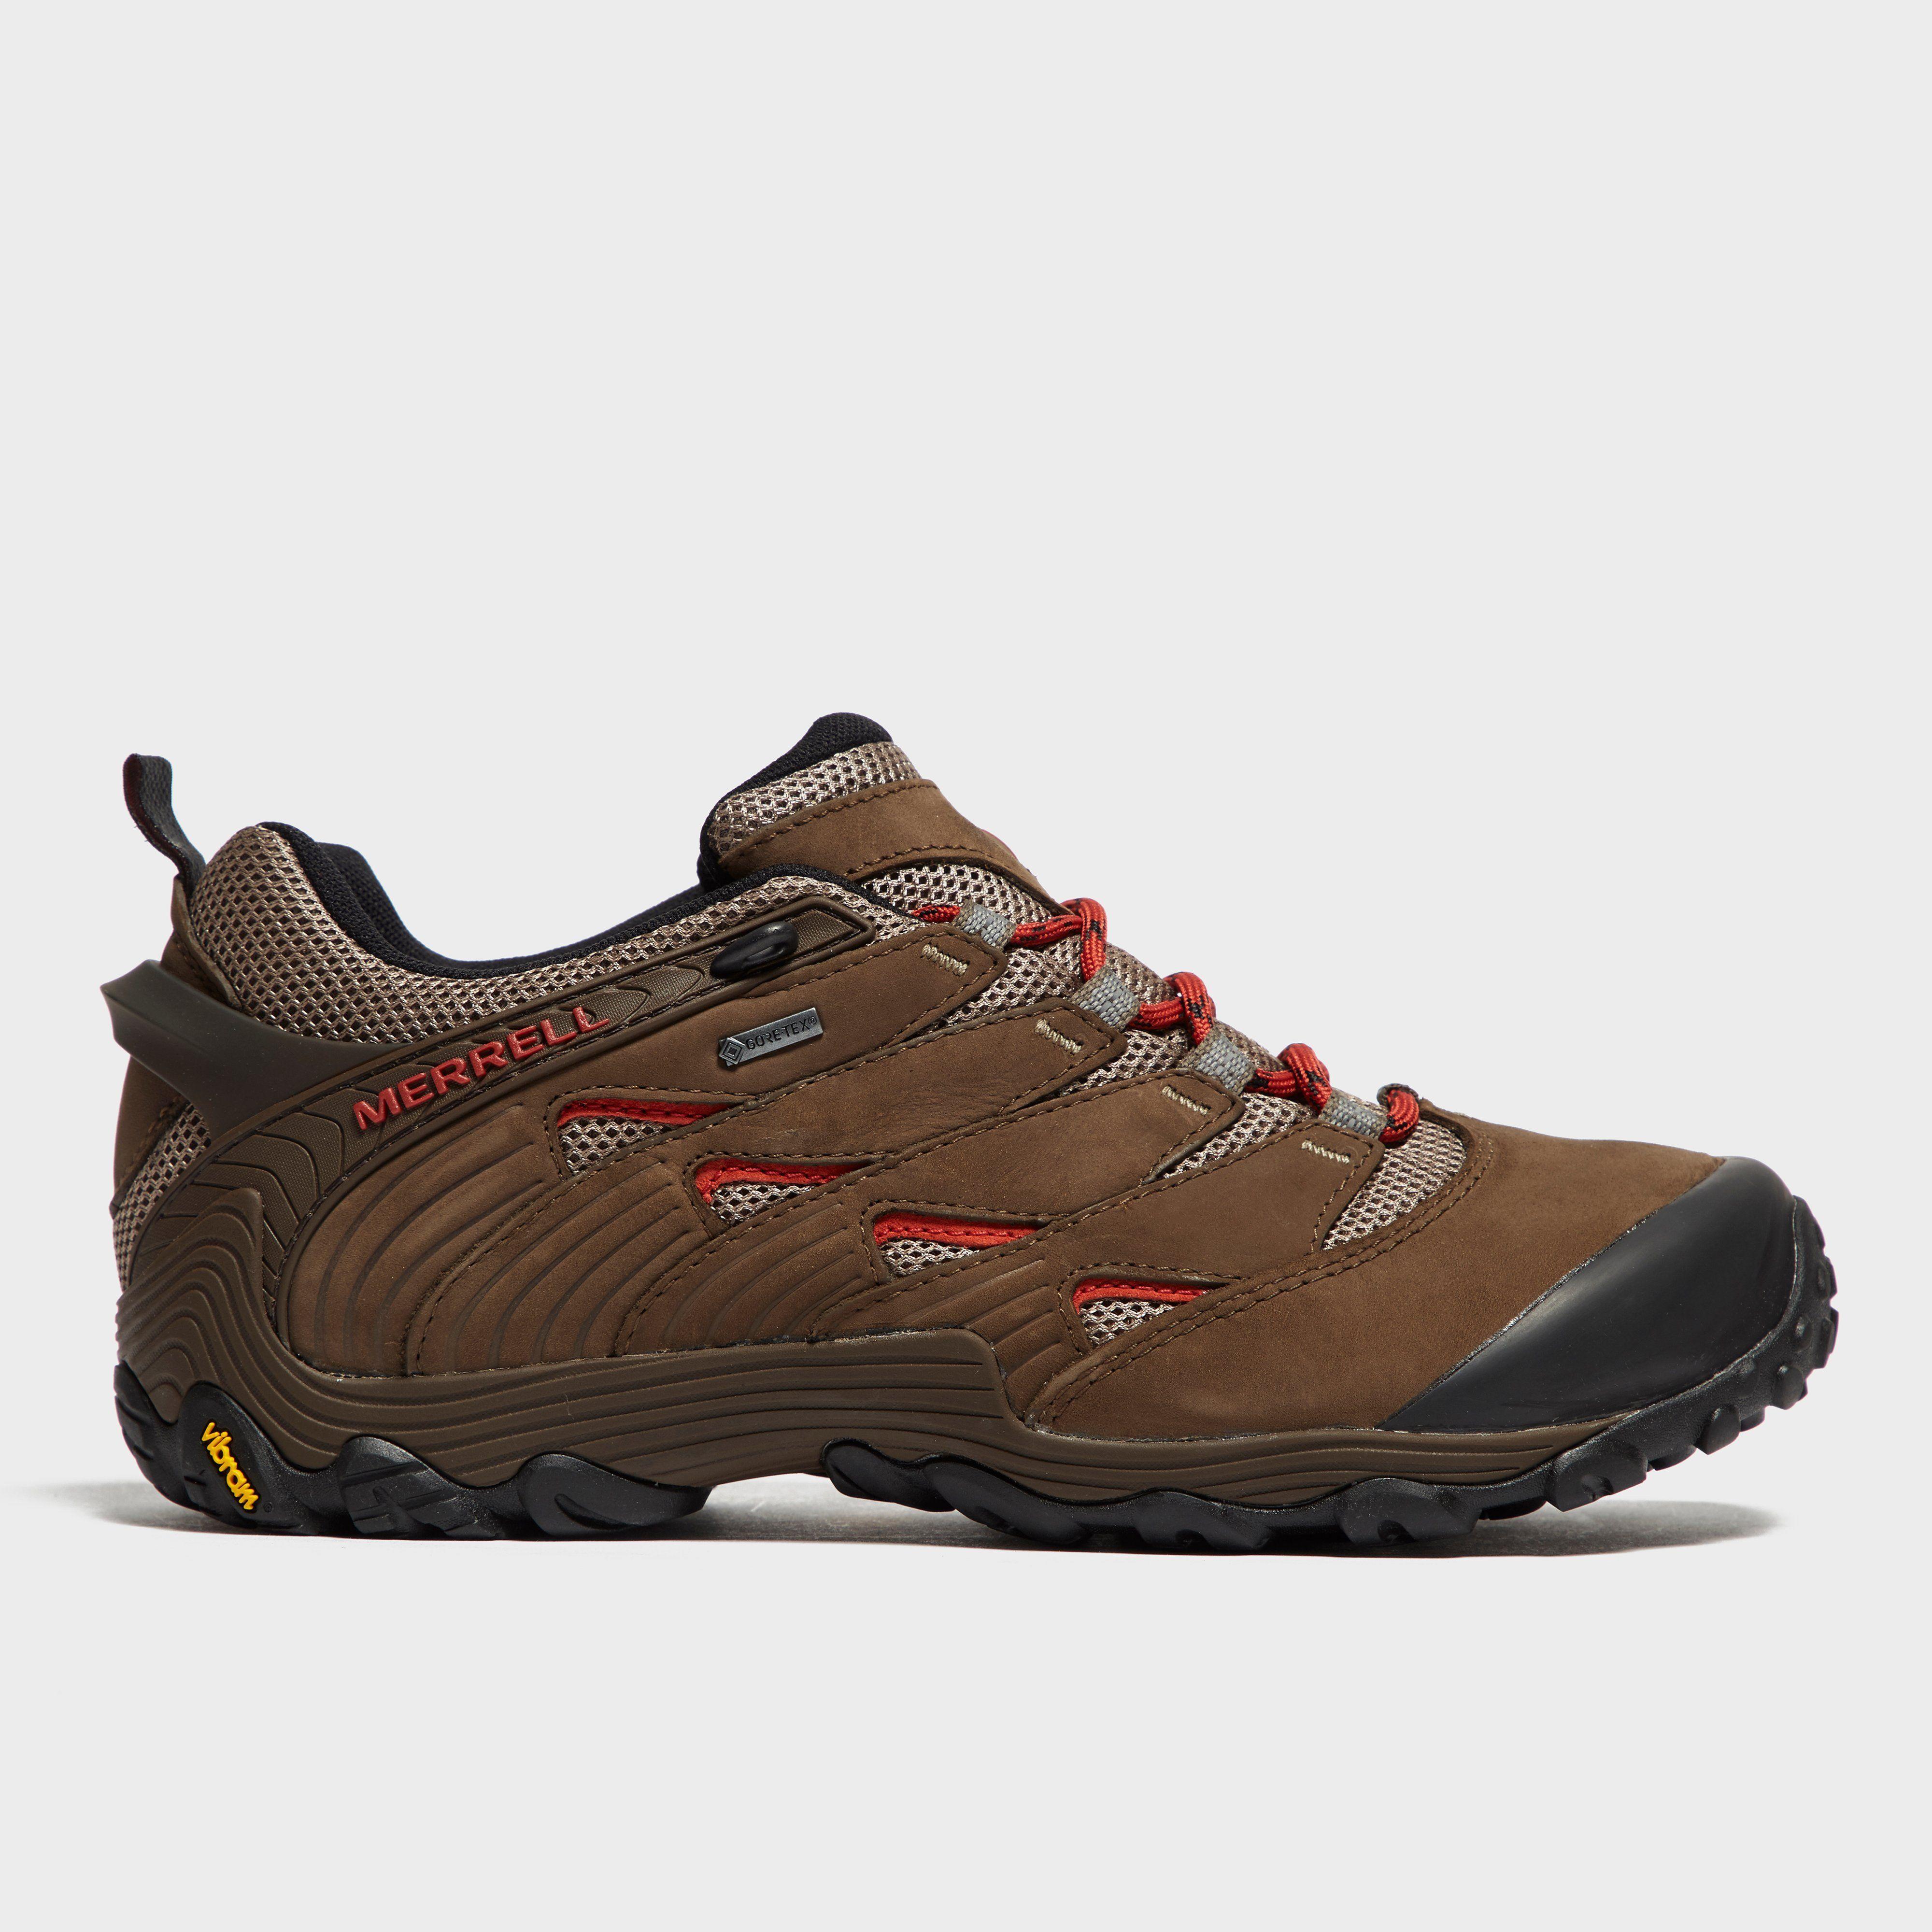 MERRELL Men's Chameleon 7 GORE-TEX® Walking Shoe